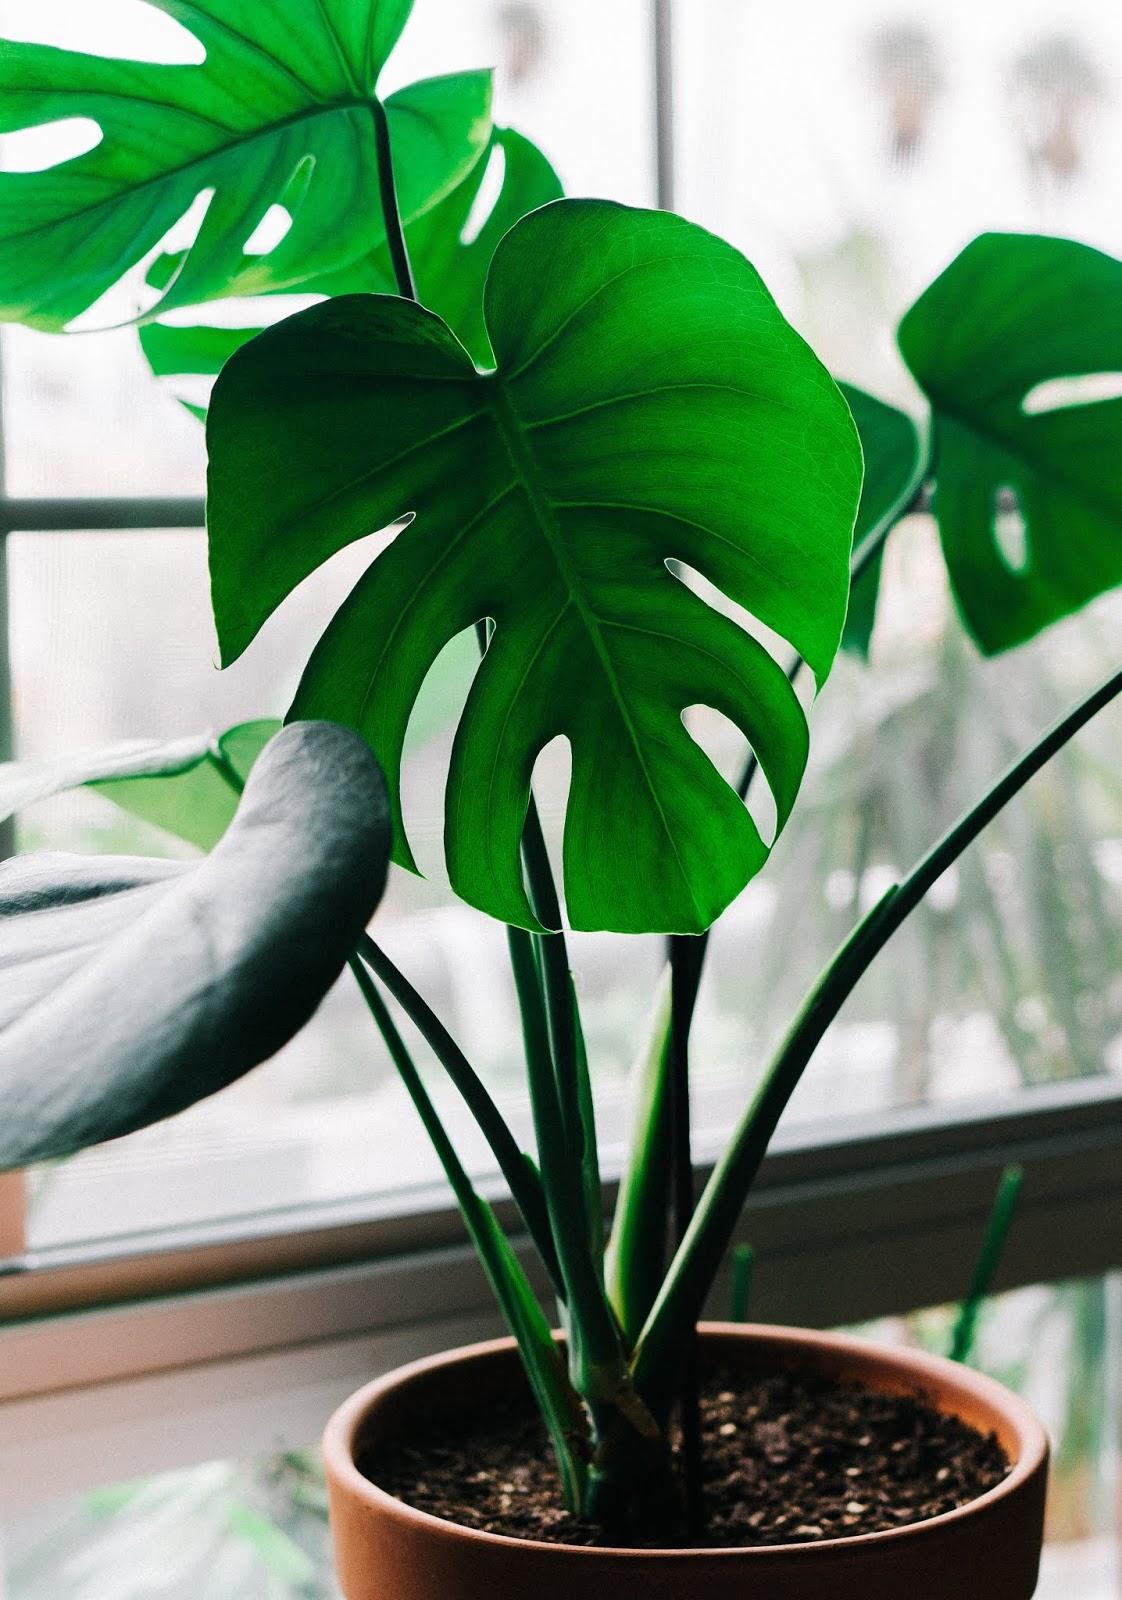 HD Green Plants Wallpapers